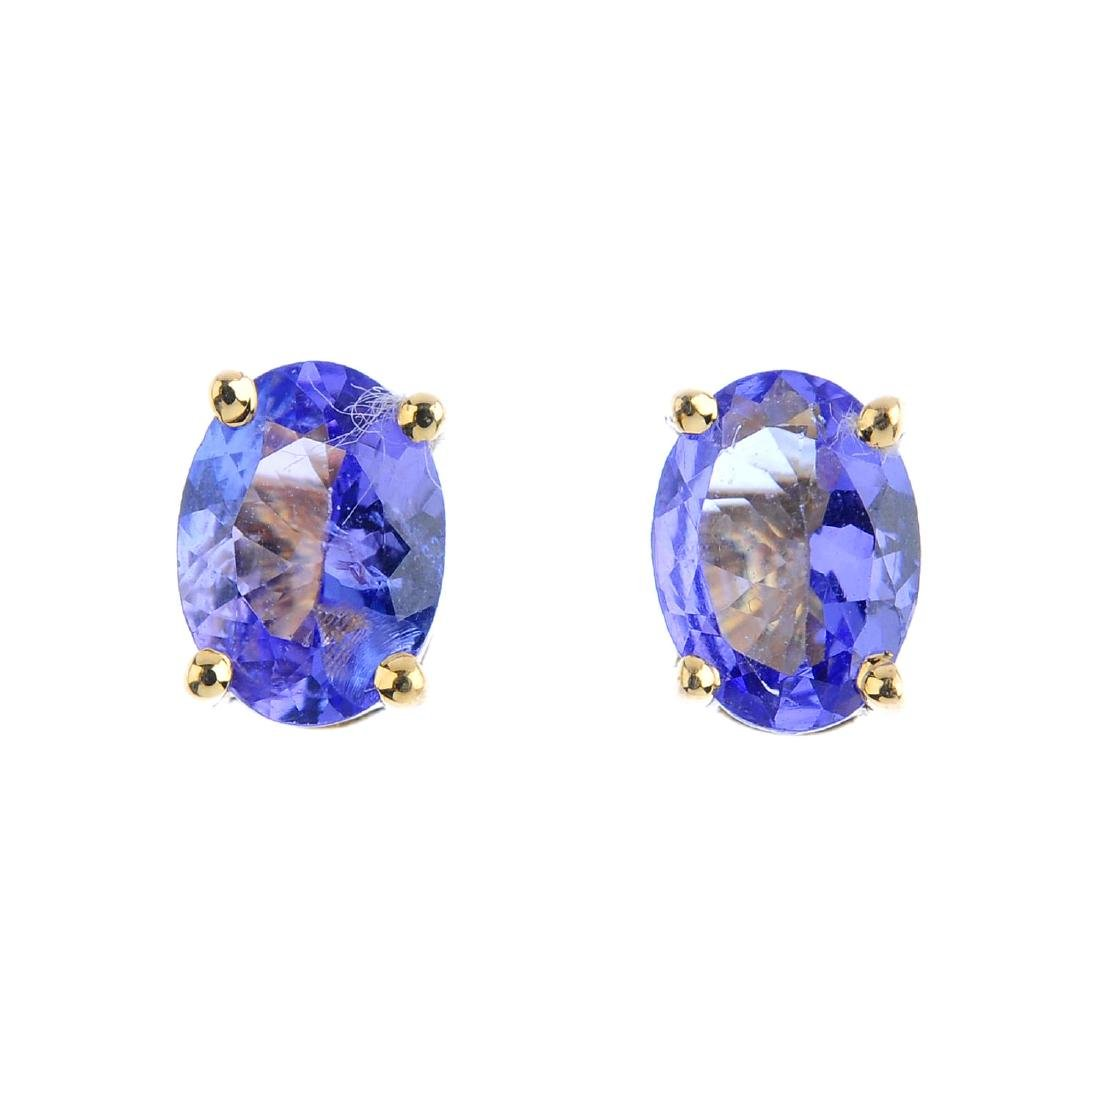 A pair of oval-shape tanzanite stud earrings. Length